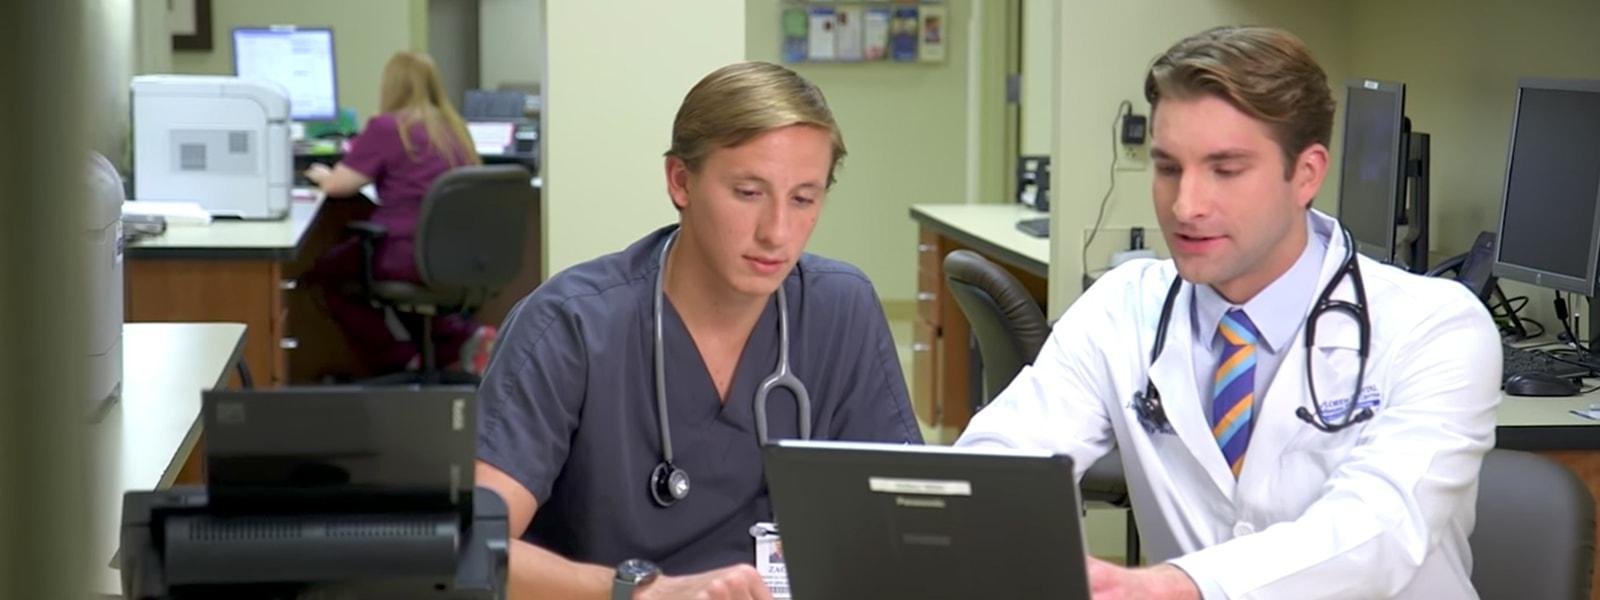 Два медицинских работника за работой